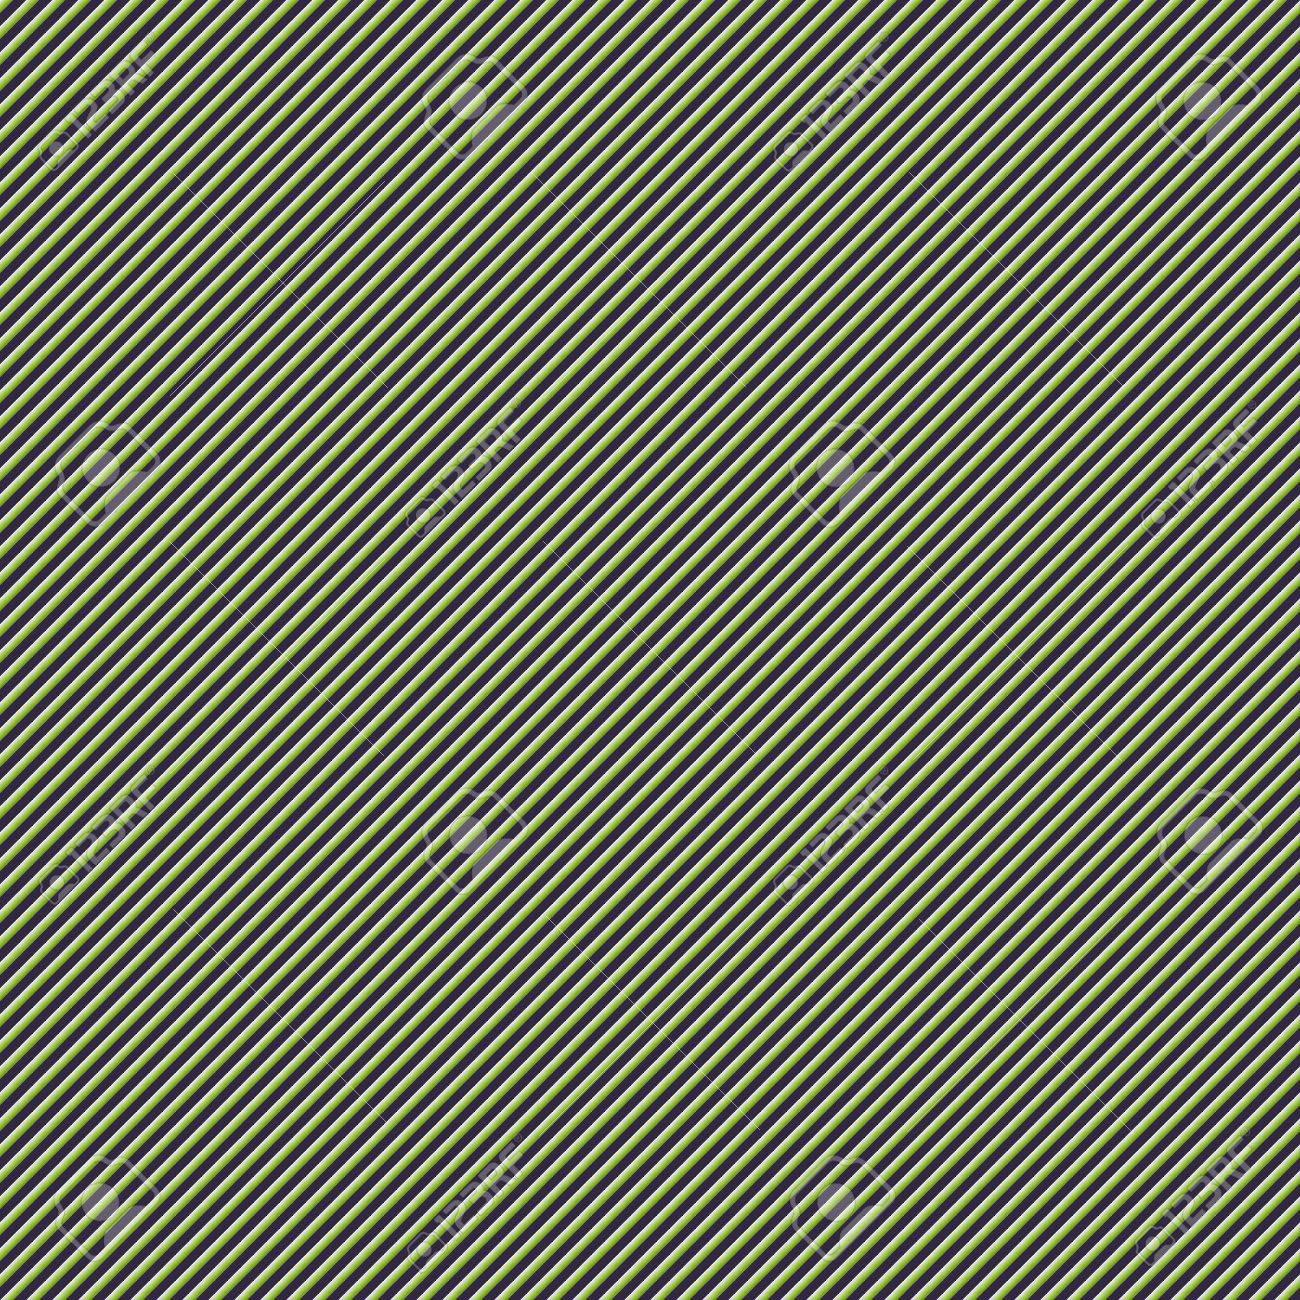 Green, purple, white diagonal lines striped diagonally on a square background. Stock Photo - 7724122